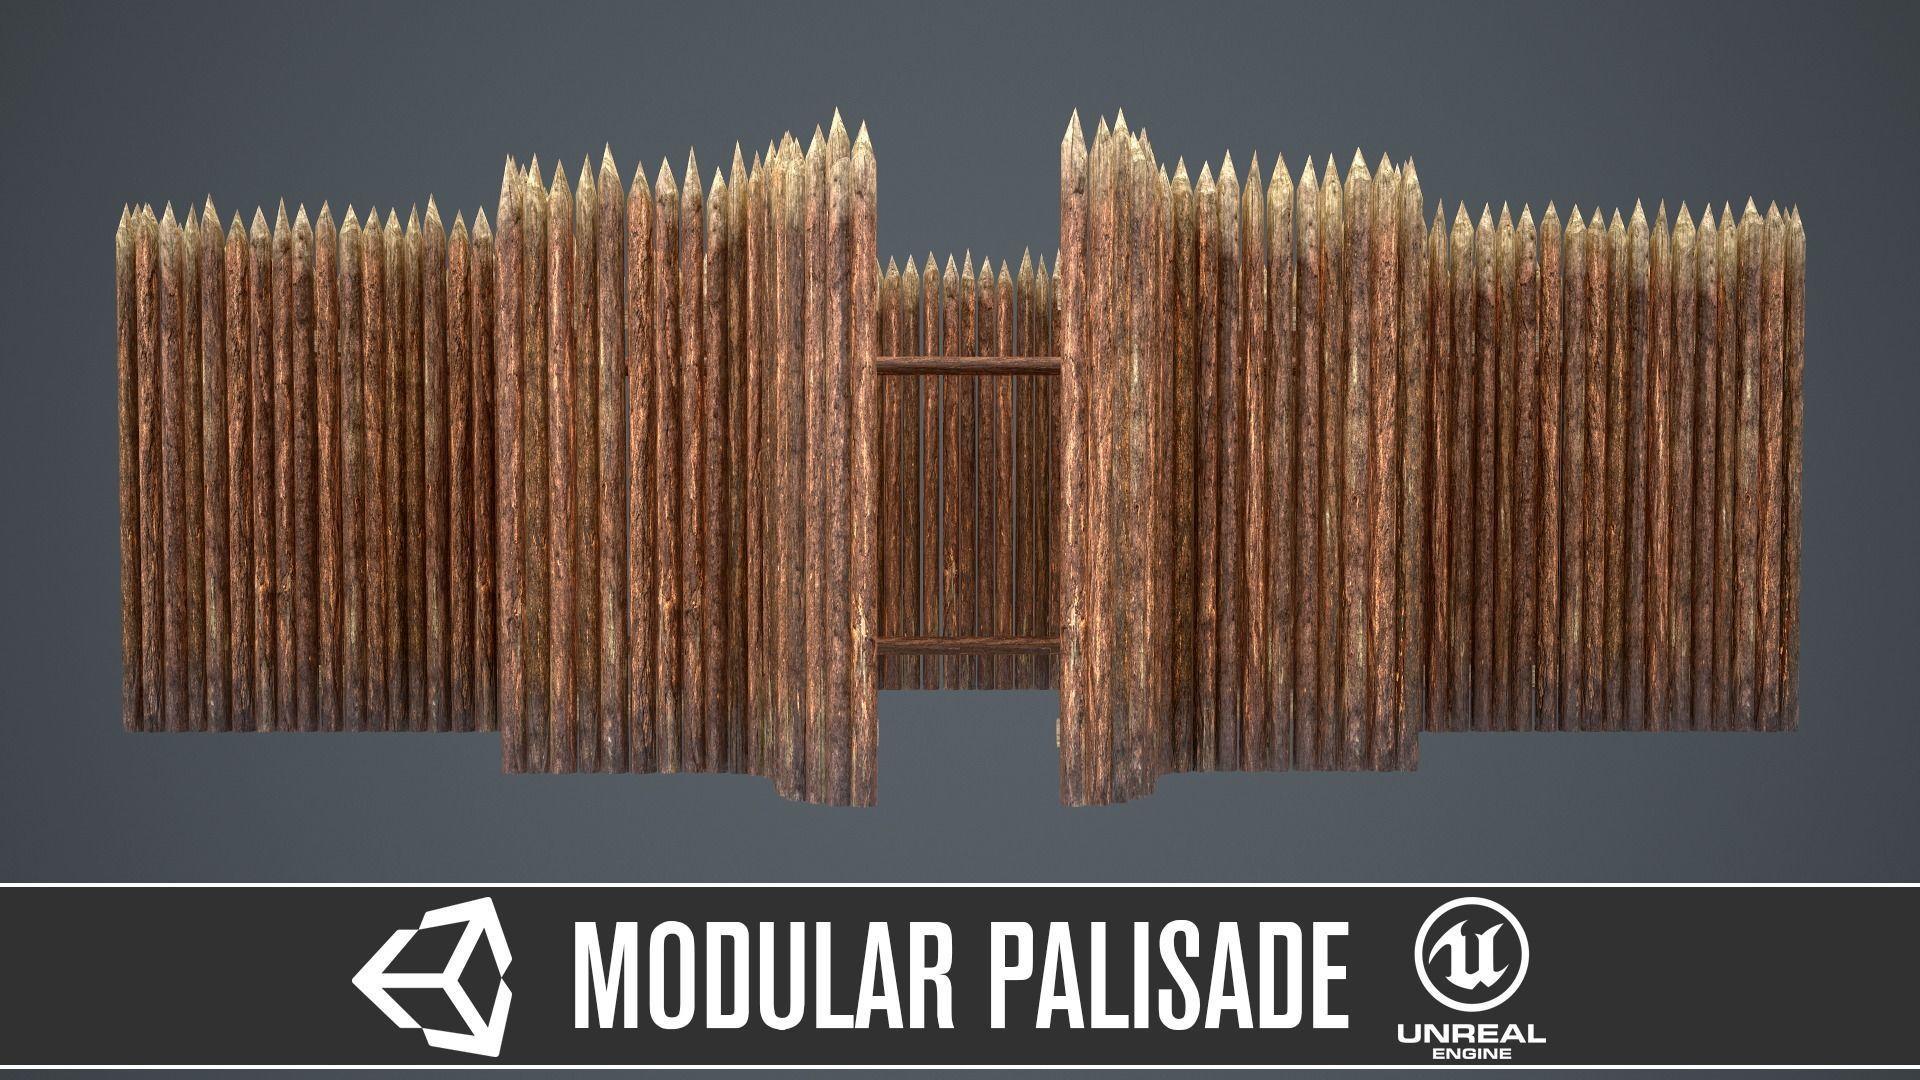 Modular castle wooden palisade